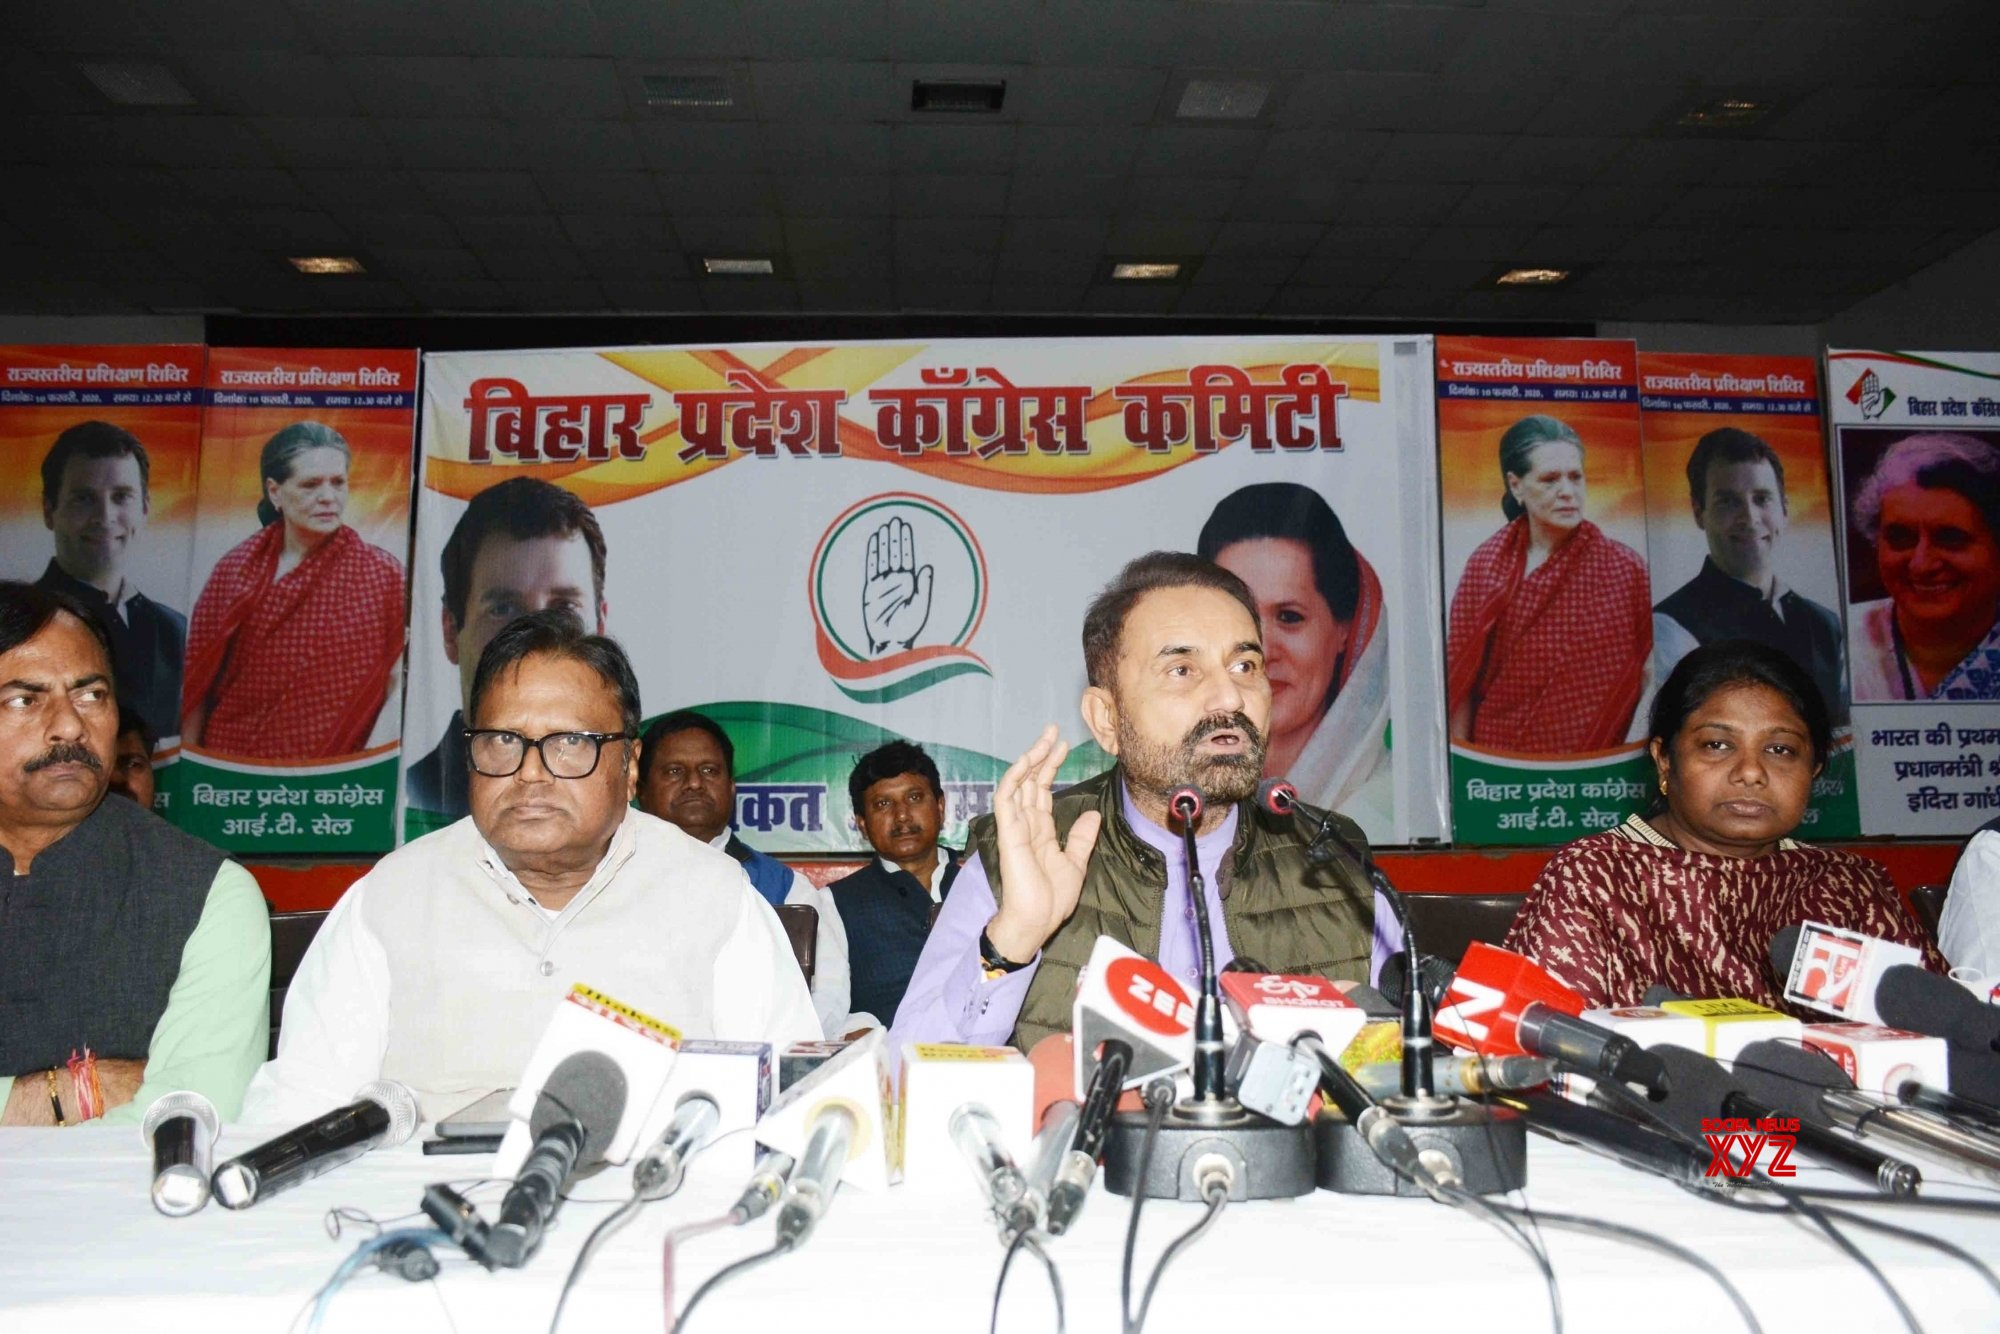 Patna: Shaktisinh Gohil's press conference #Gallery